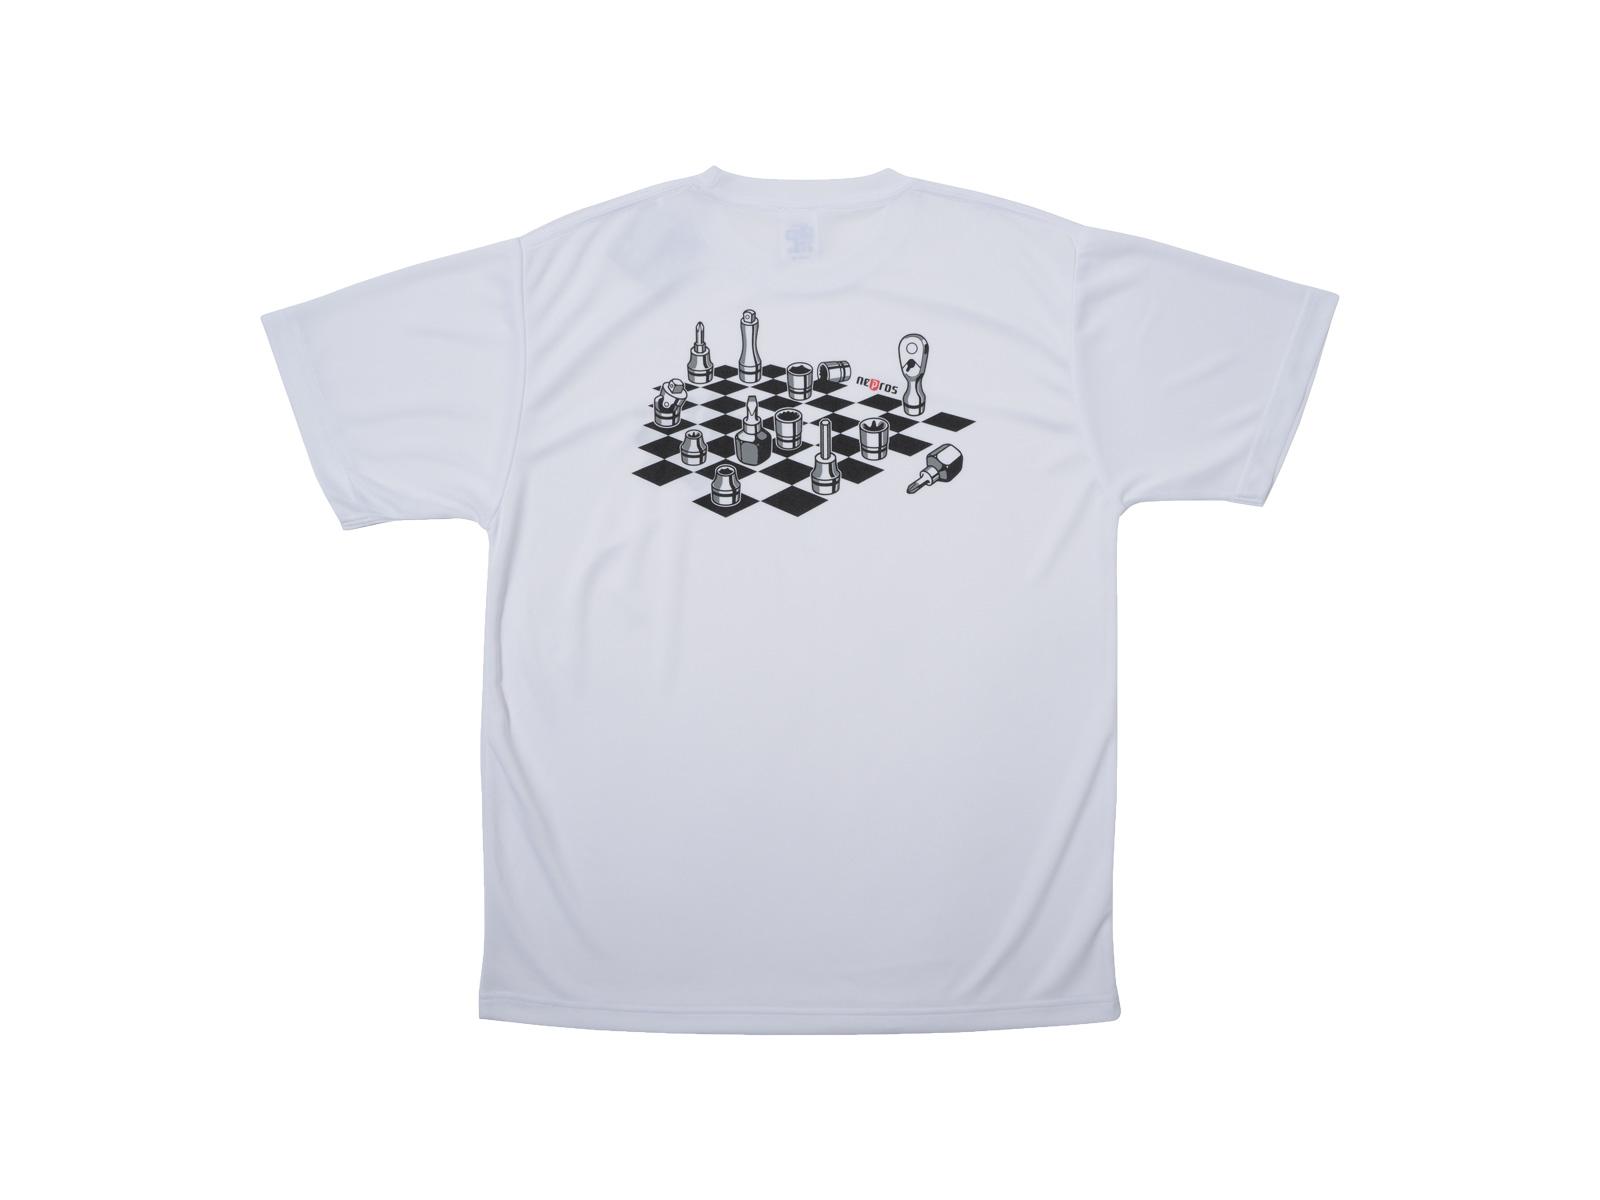 nepros工具チェスドライTシャツ 裏